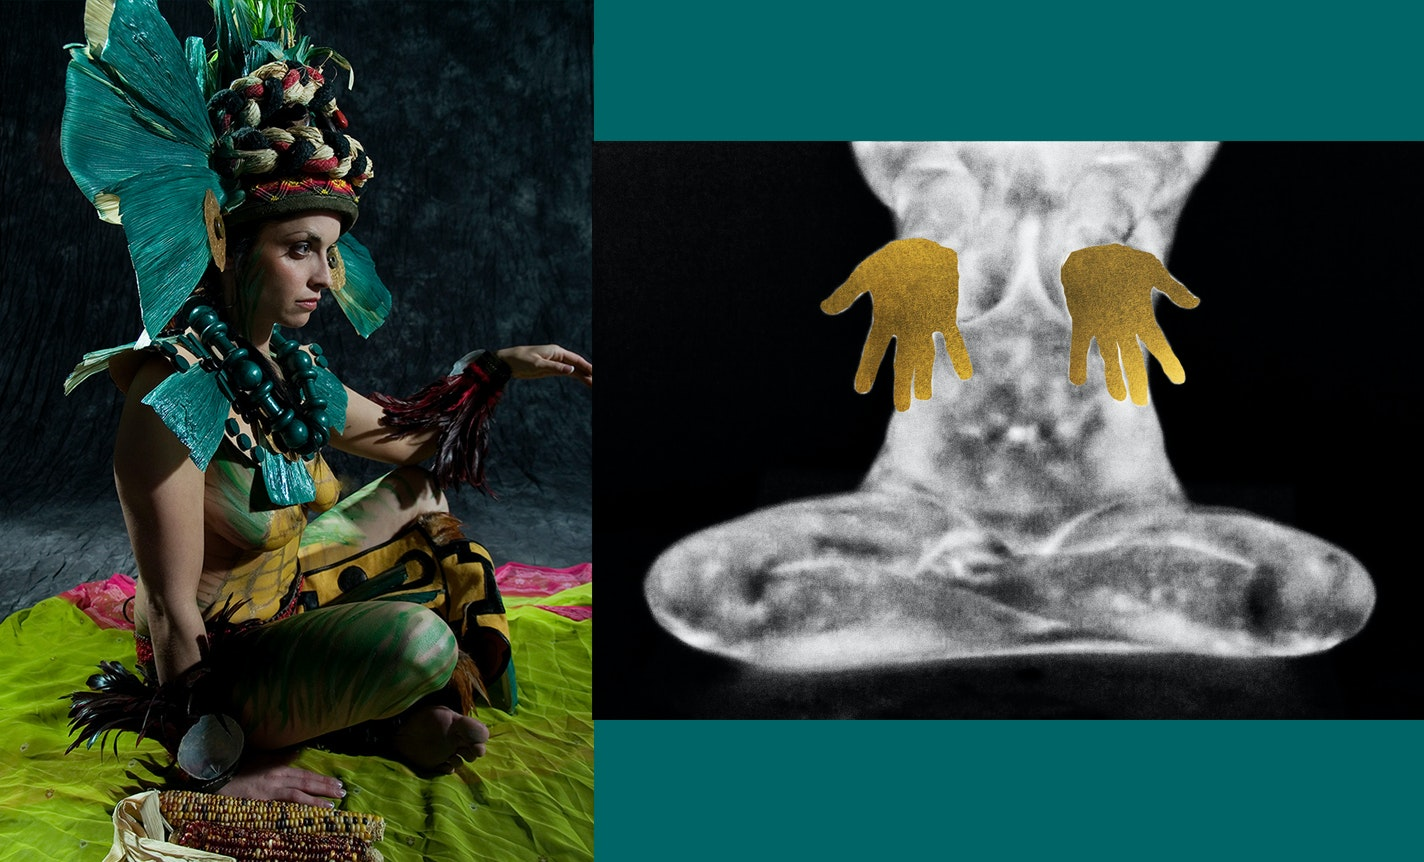 Art Exhibition: 'Quietus' + 'Deidades' November 3 - 21, 2021